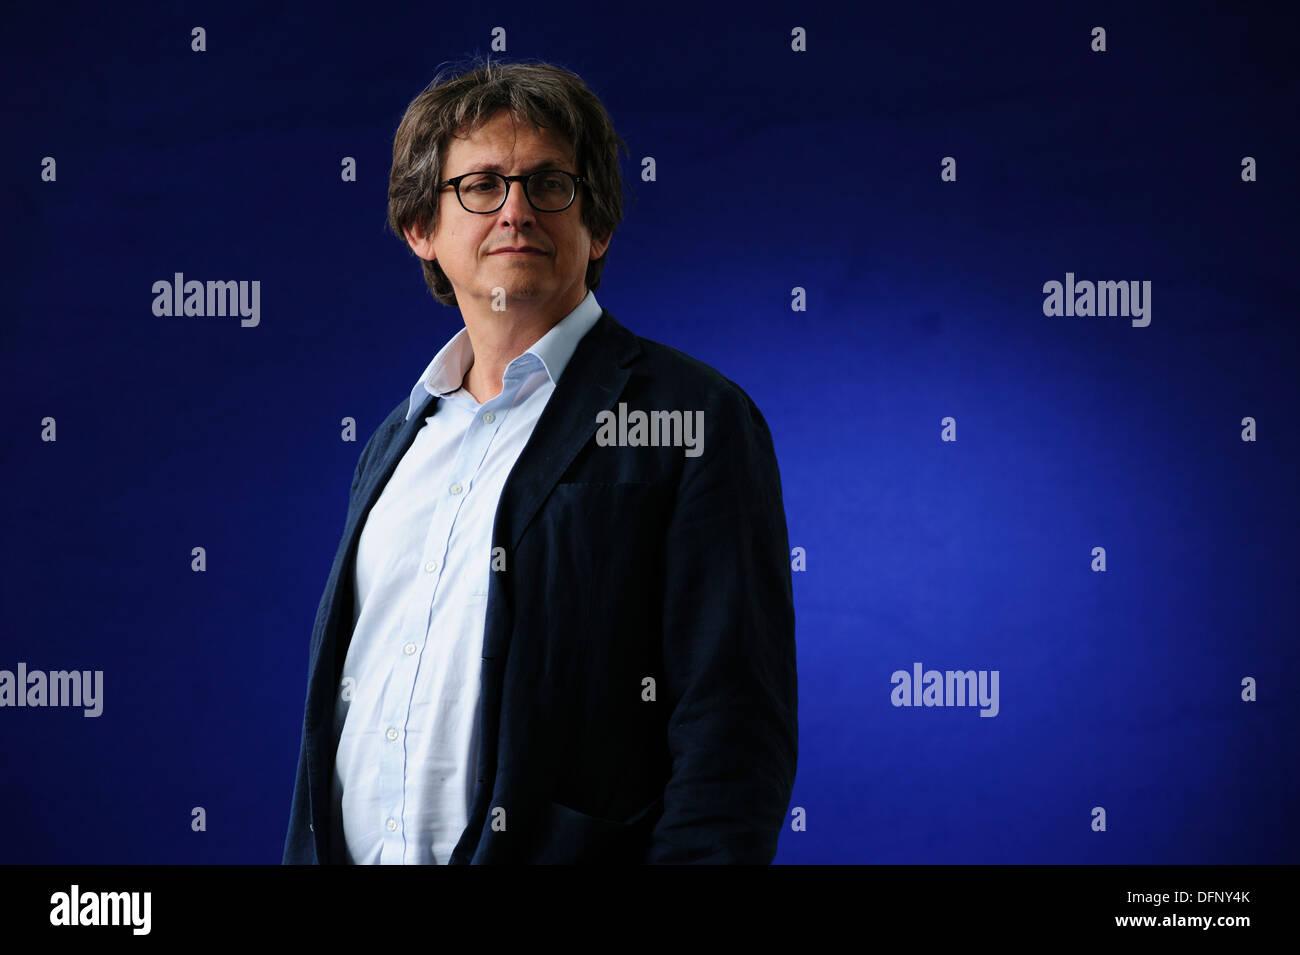 Alan Rusbridger, Editor of The Guardian and author, attending at the Edinburgh International Book Festival 2013. - Stock Image